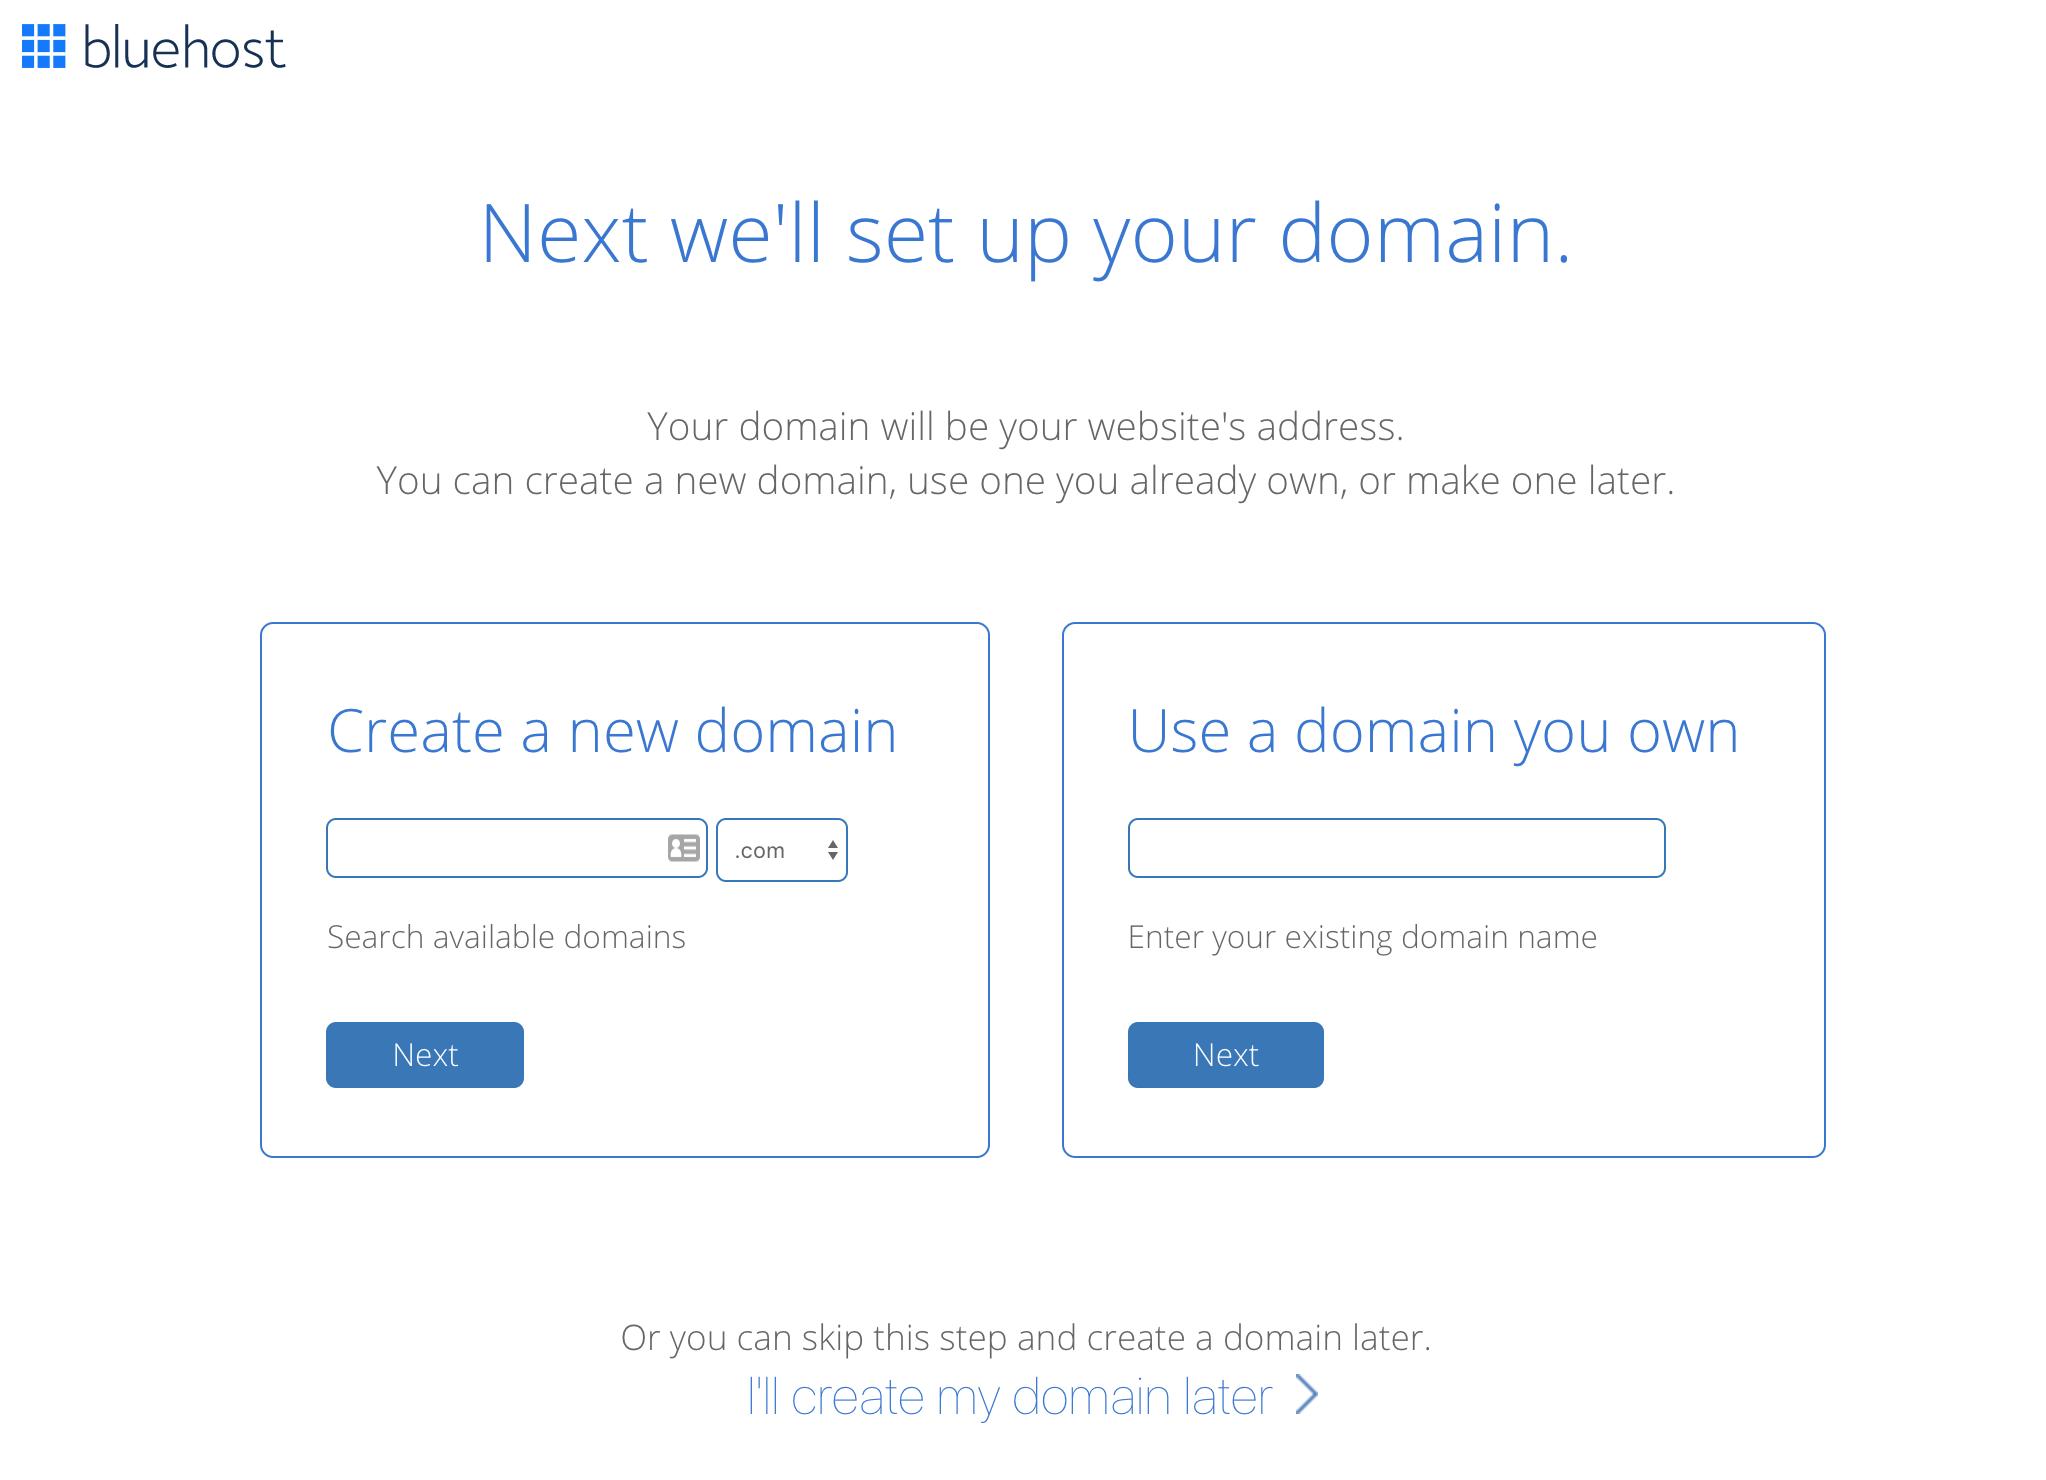 Bluehost domain setup page